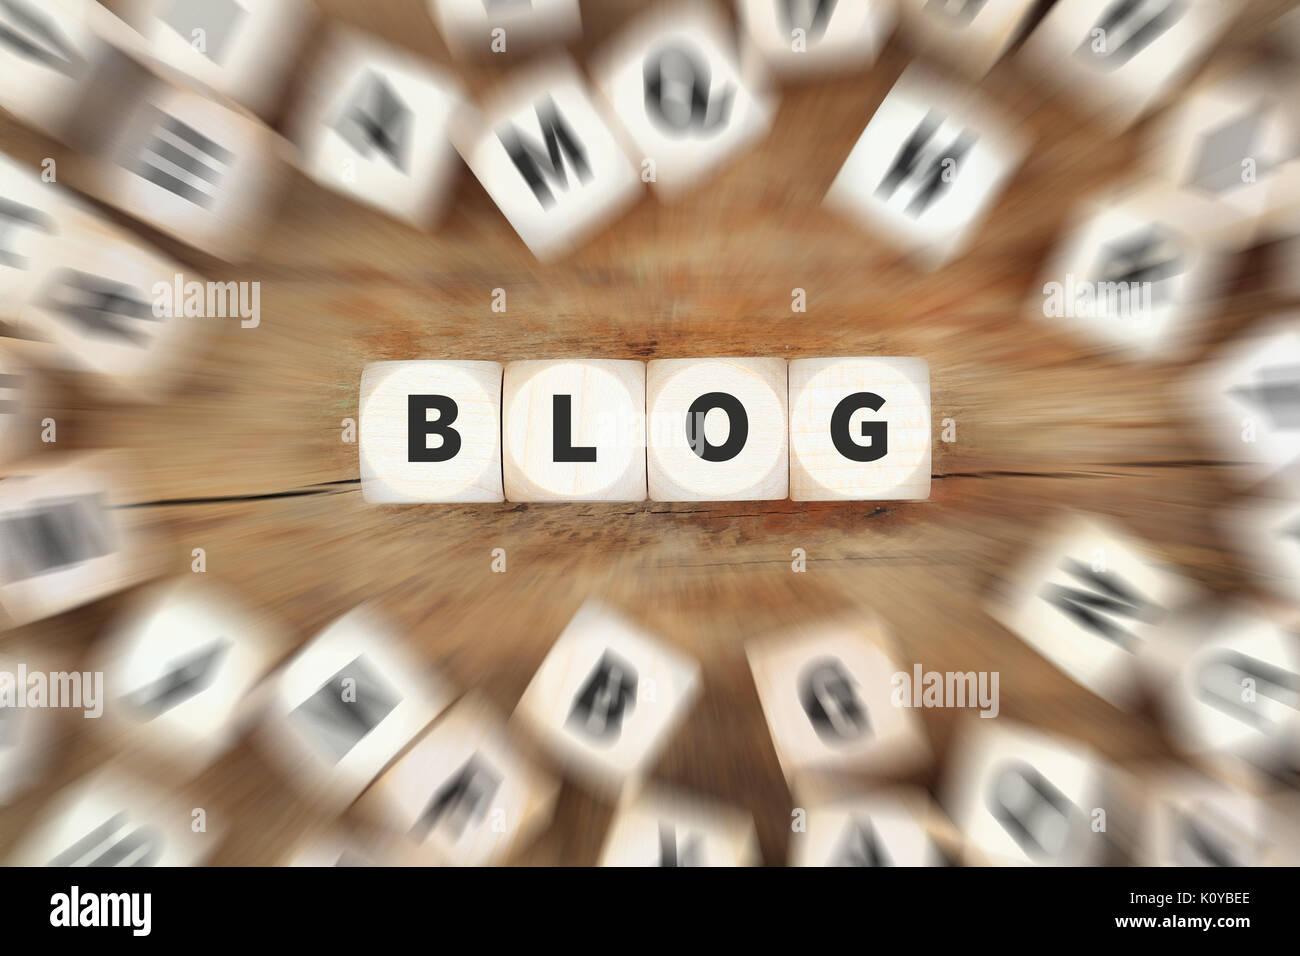 Blog blogger blogging dice business concept idea - Stock Image